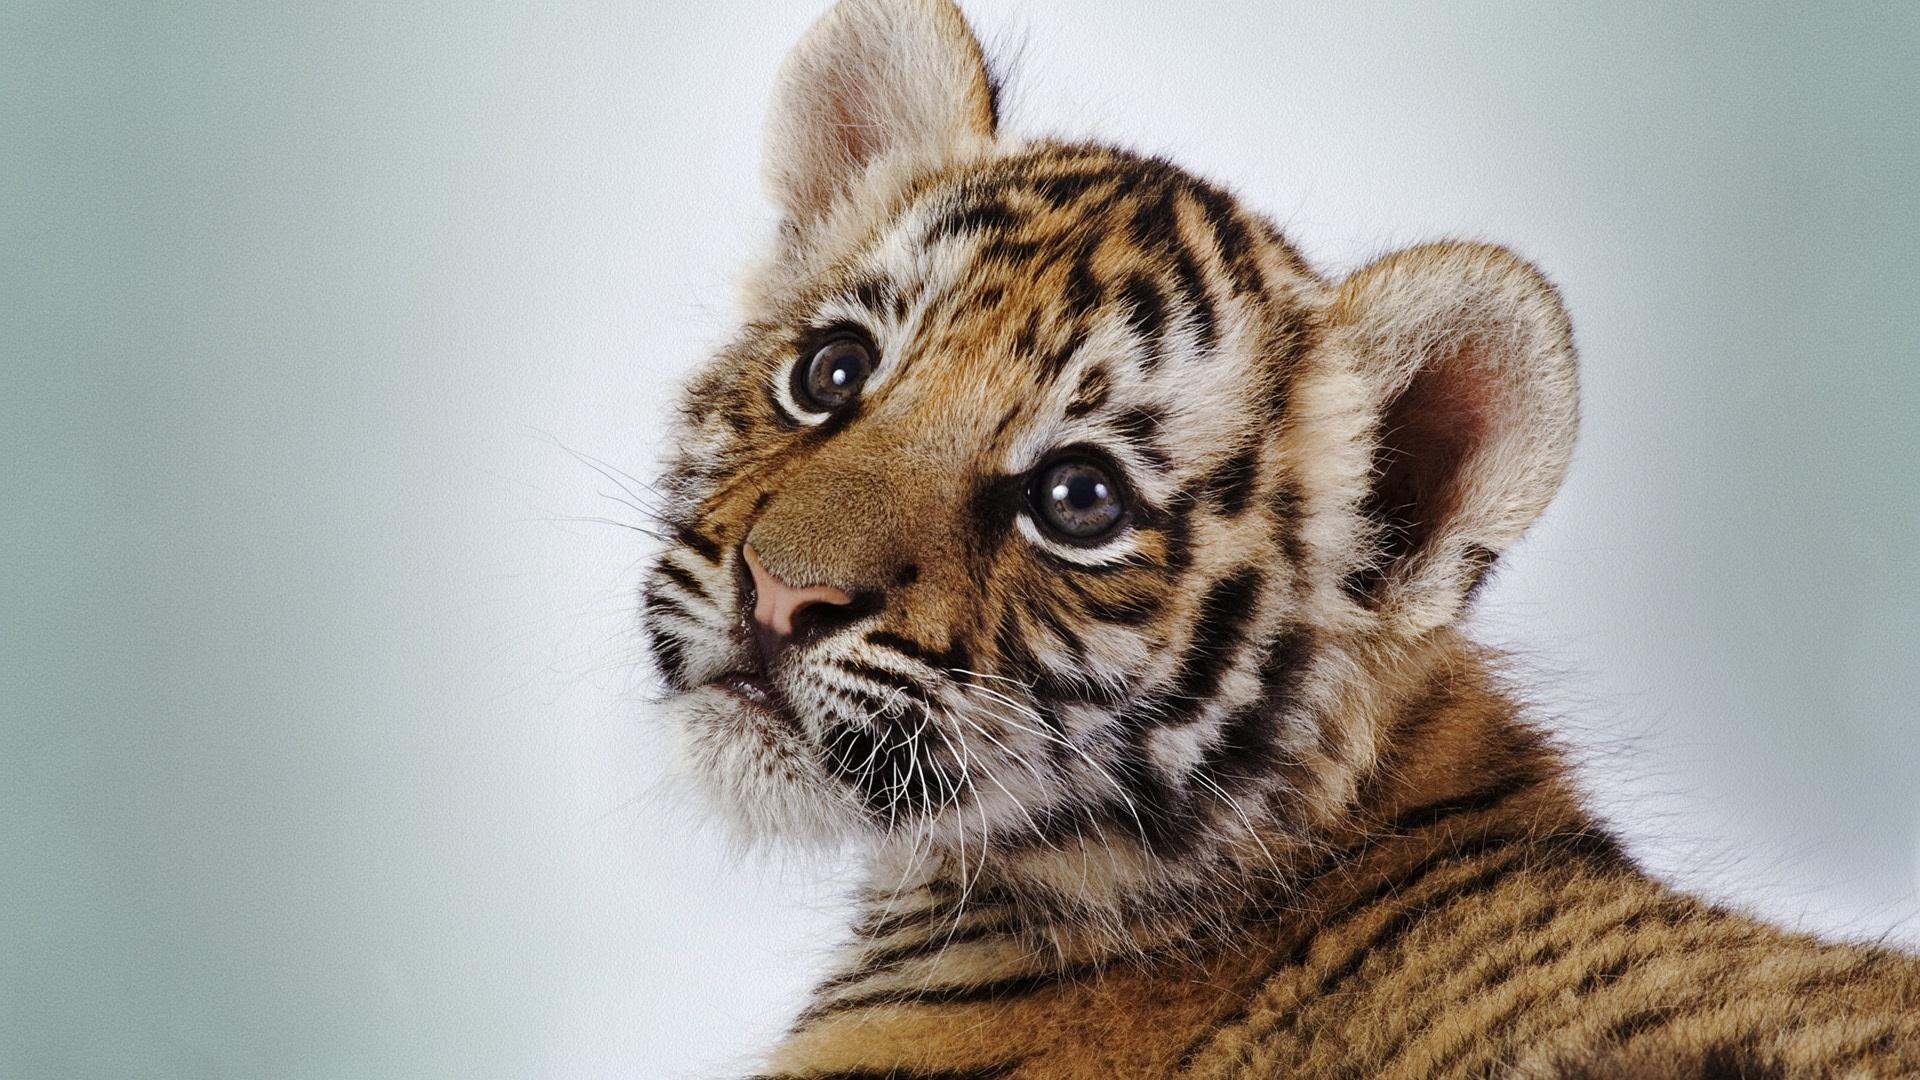 Tiger HD wallpaper | 1920x1080 | #14434